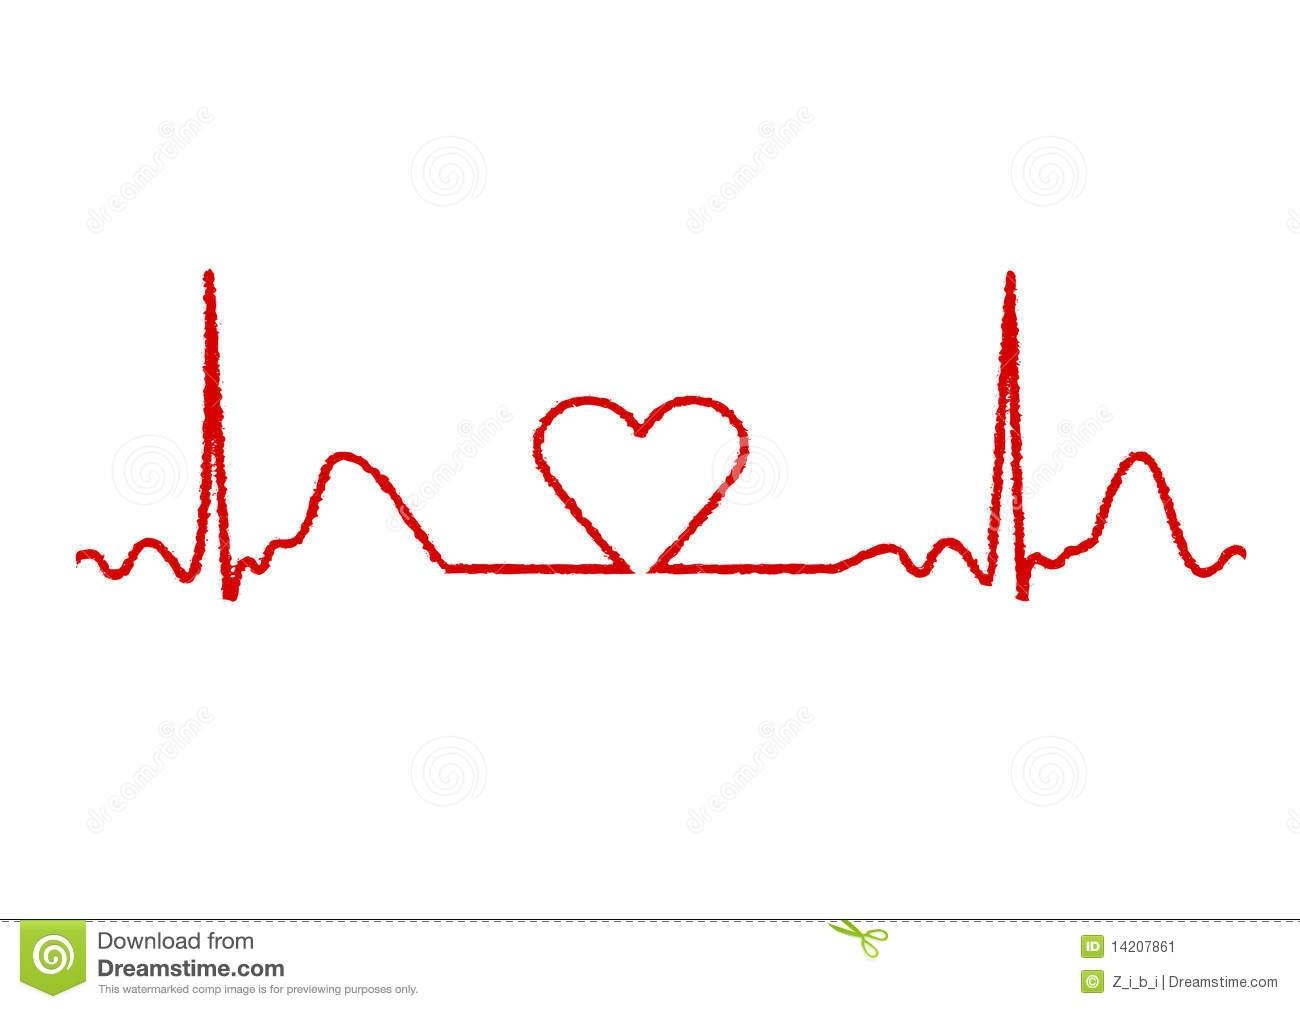 Lines clipart heart rate Clipartsgram Heart Clipart com Clipart